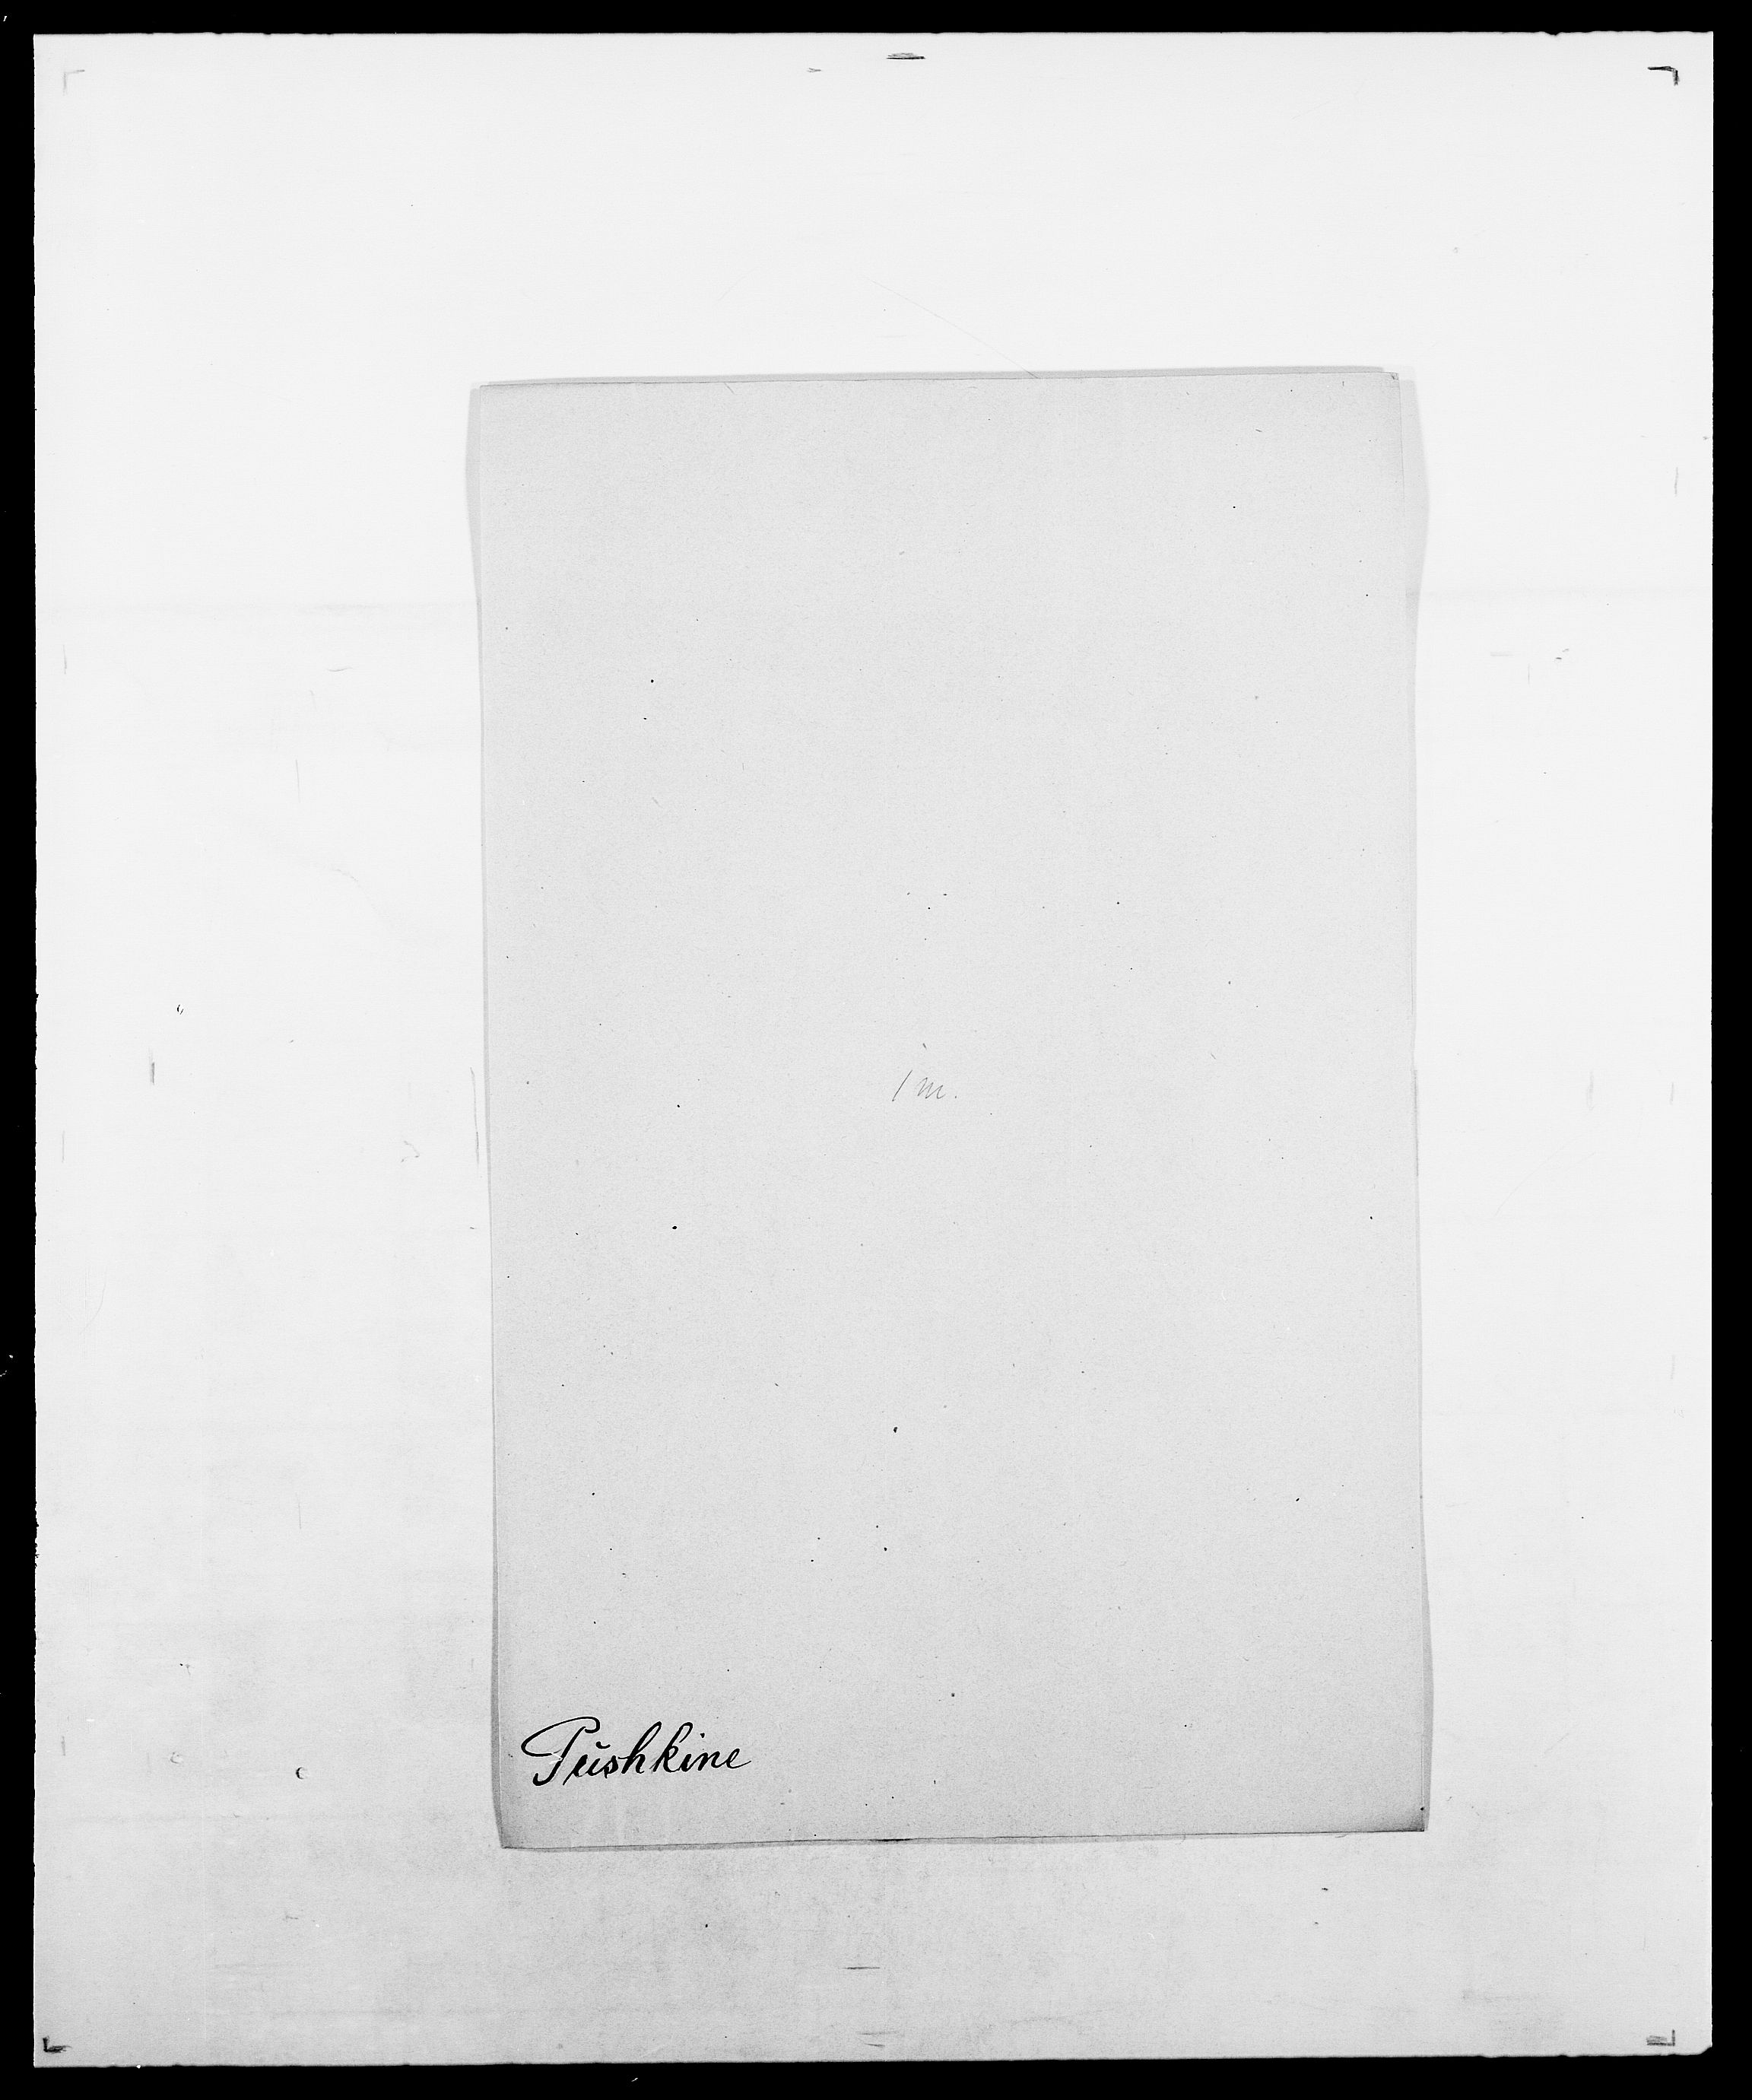 SAO, Delgobe, Charles Antoine - samling, D/Da/L0031: de Place - Raaum, s. 447